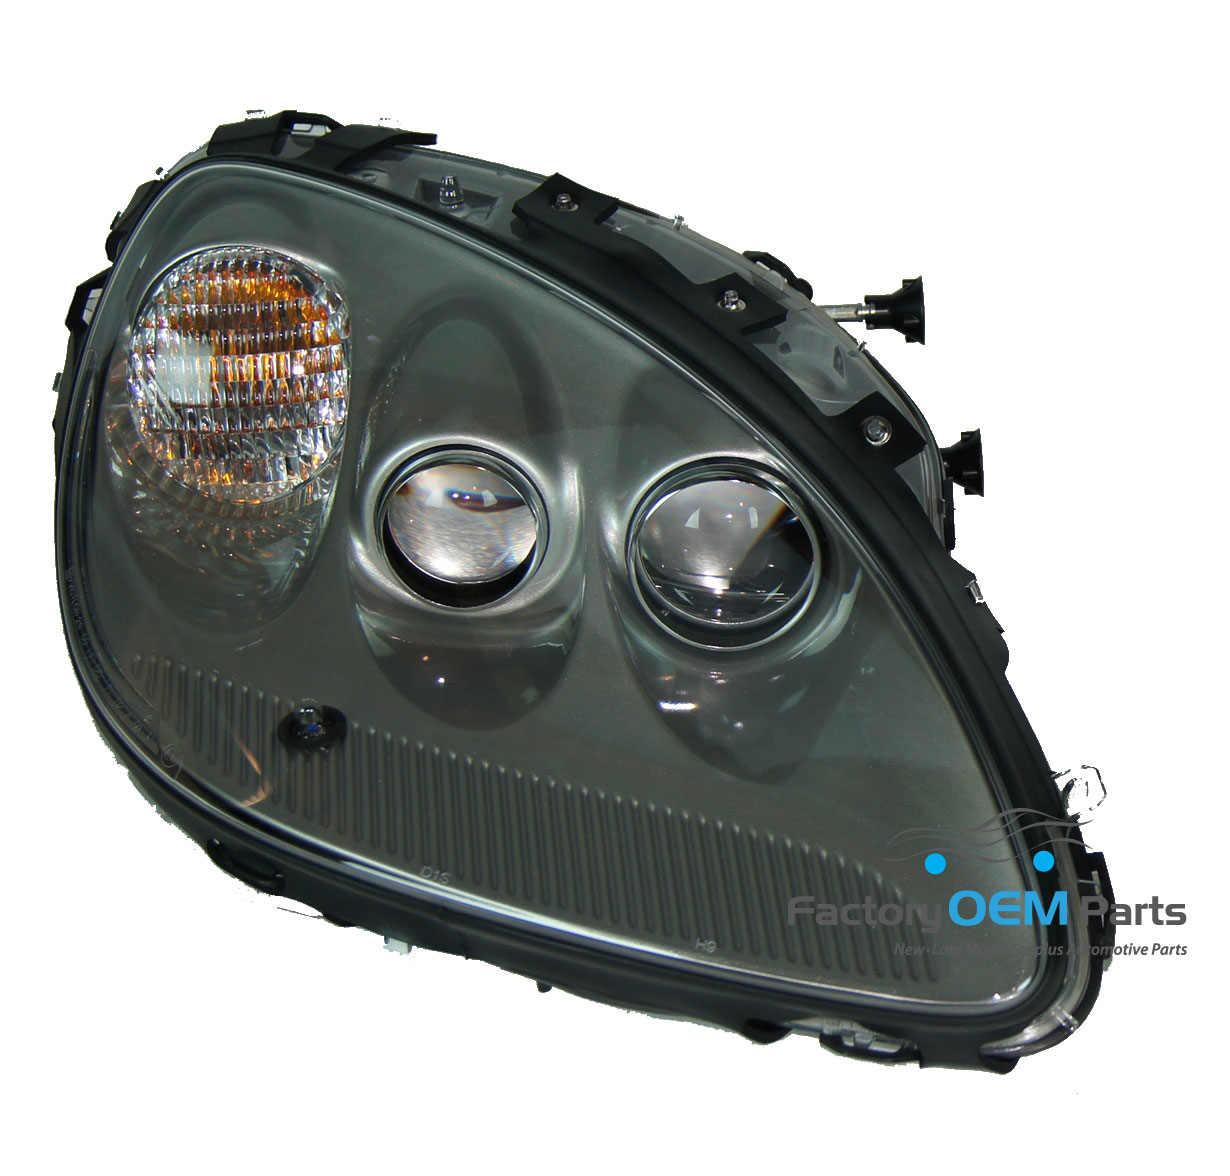 05 08 corvette rh passenger side c6 silver headlight head. Black Bedroom Furniture Sets. Home Design Ideas